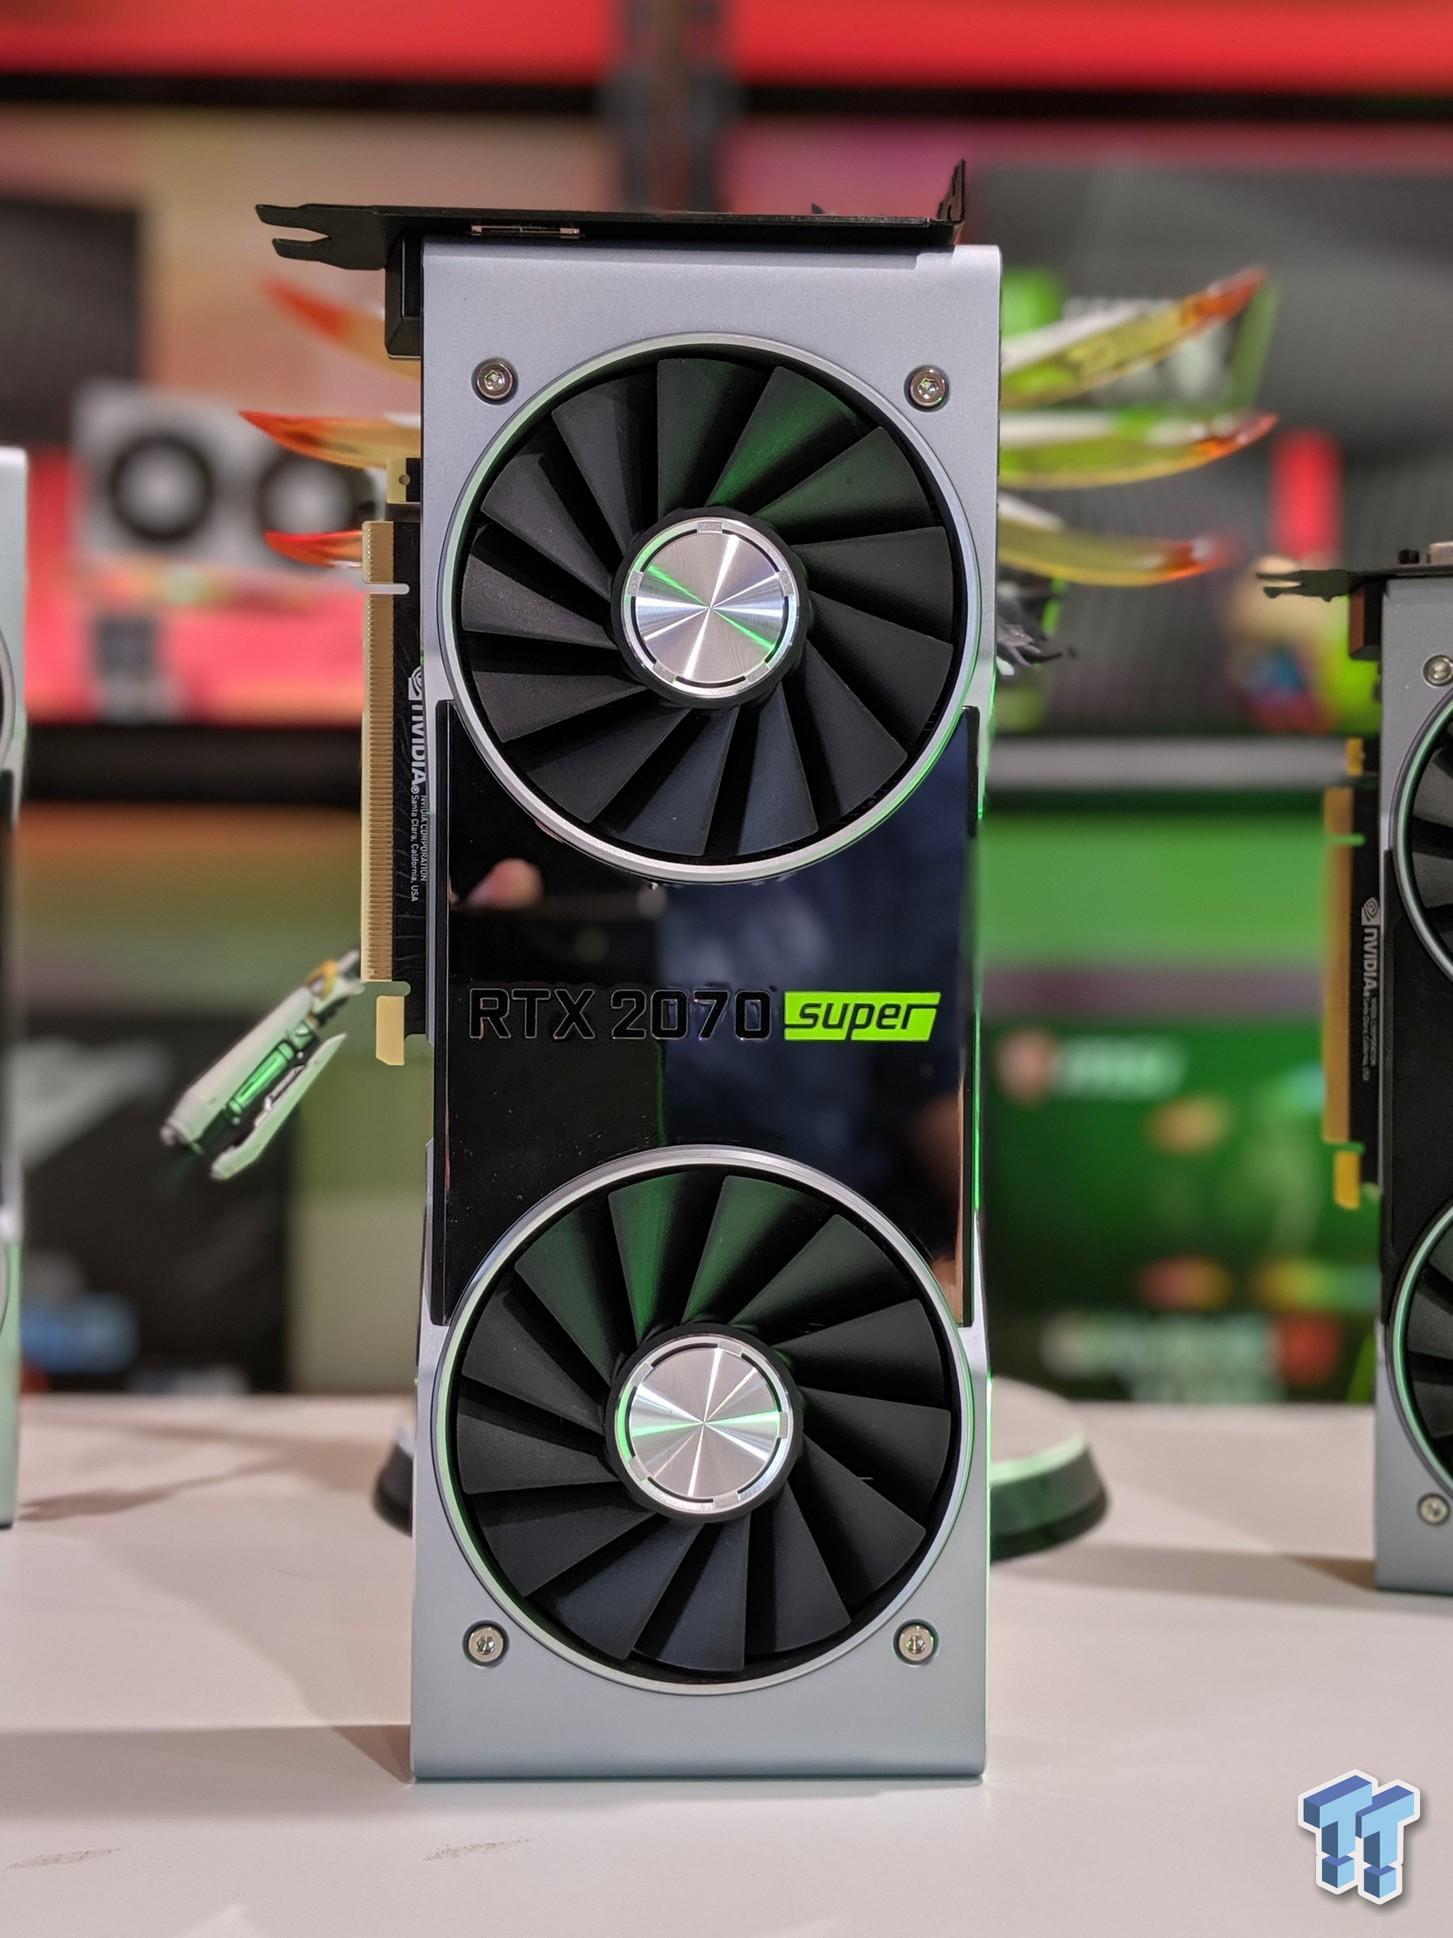 NVIDIA GeForce RTX 2070 SUPER: TITAN Xp Performance For $499